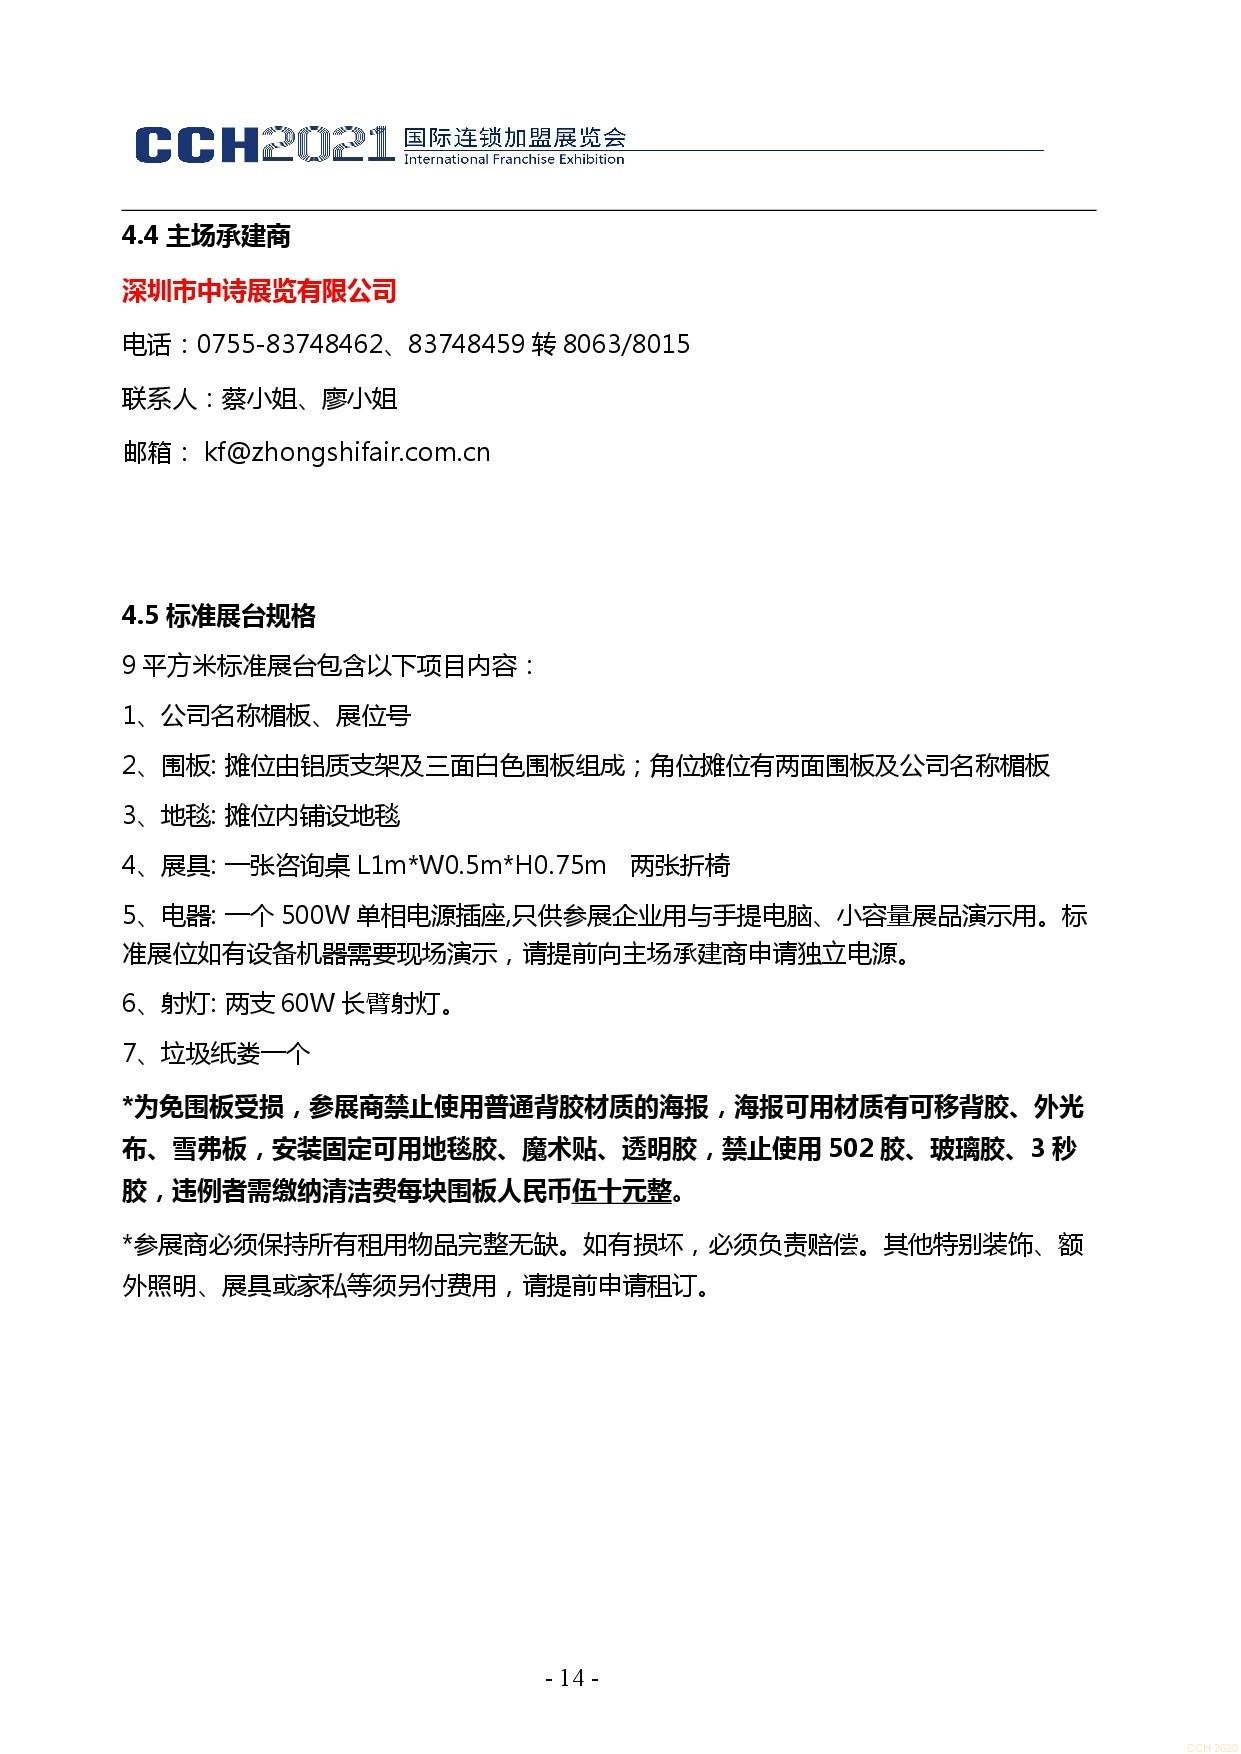 0416CCH深圳展参展商手册4.16-014.jpg